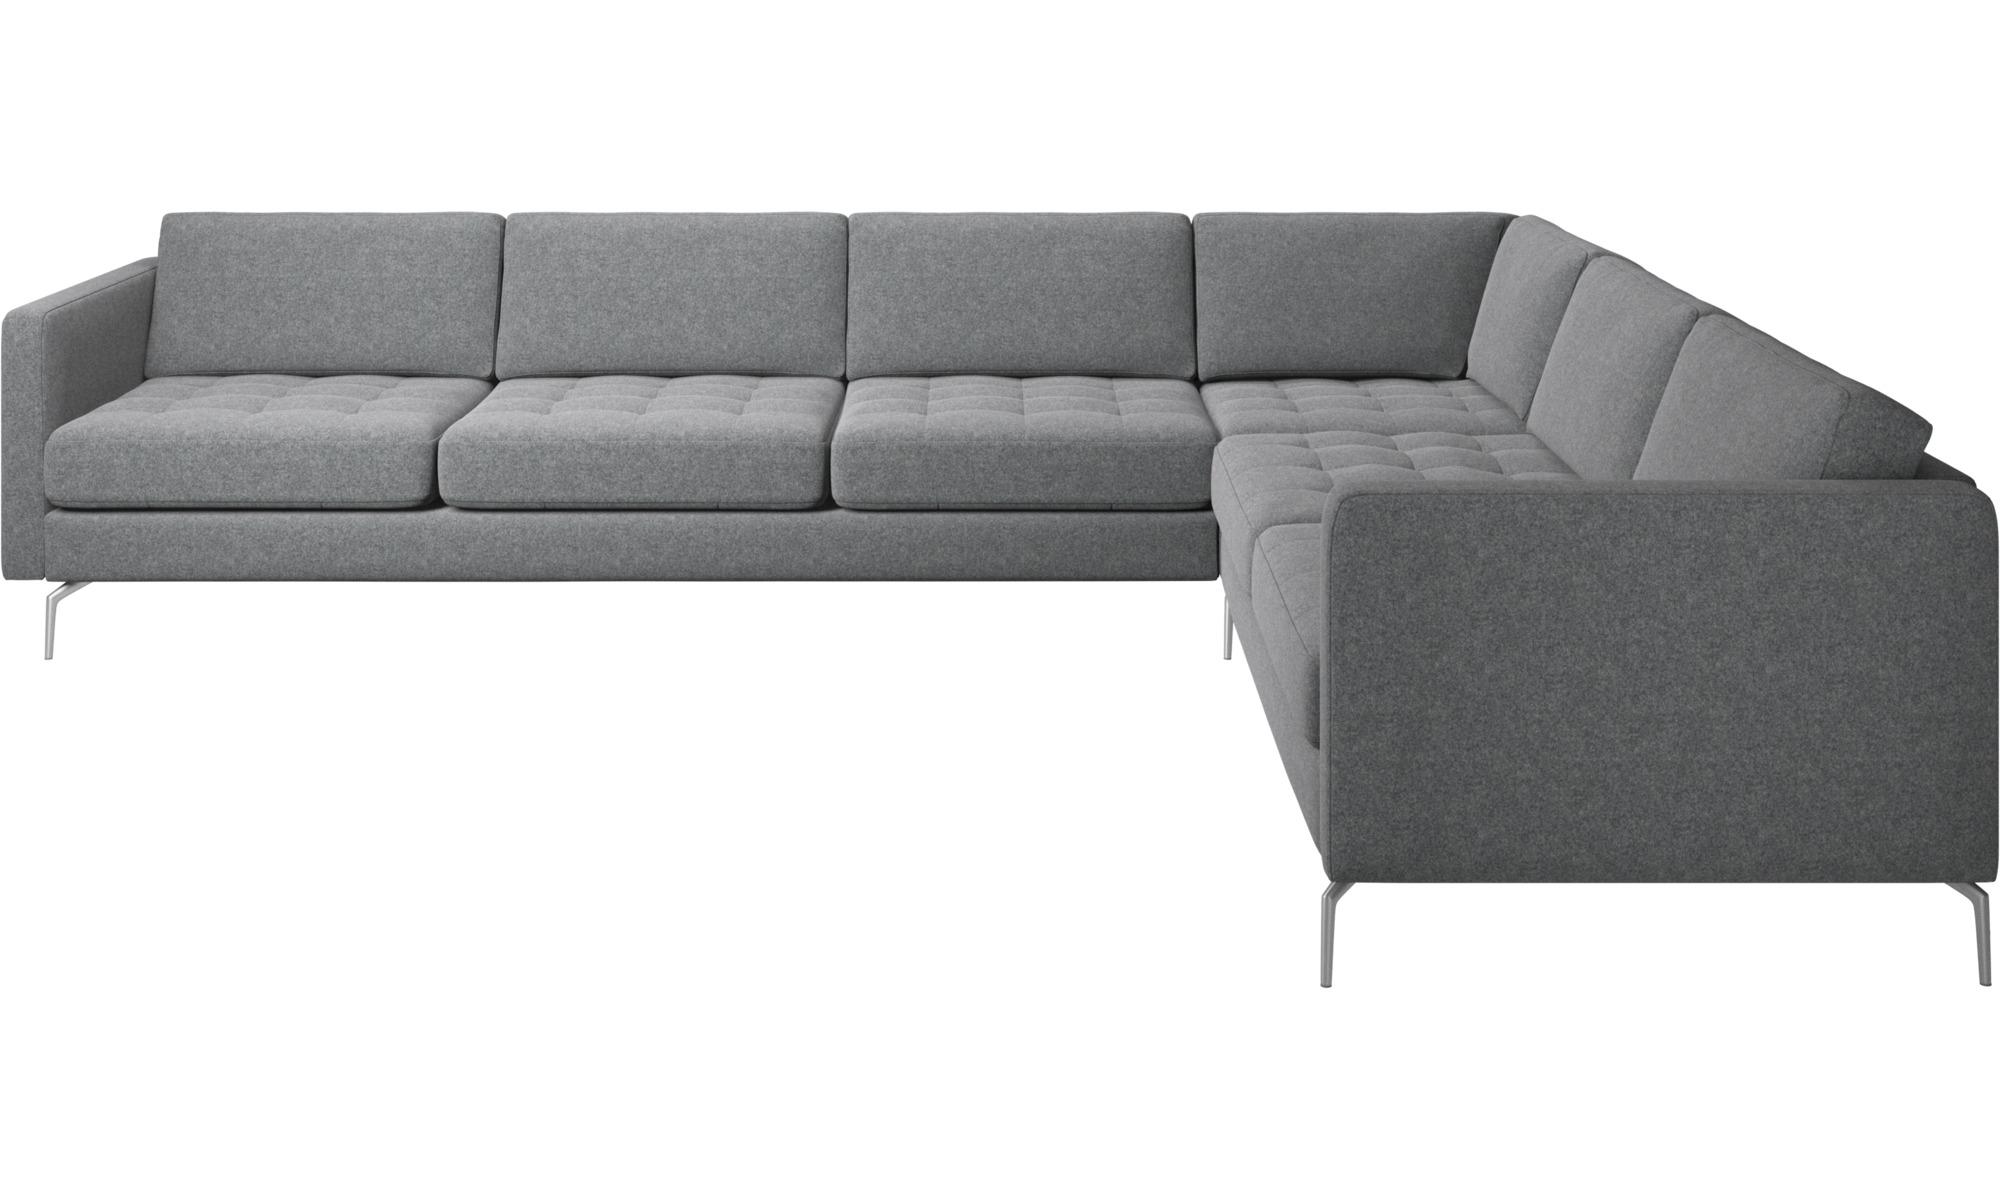 canap s d 39 angle canap d 39 angle osaka assise capitonn e boconcept. Black Bedroom Furniture Sets. Home Design Ideas